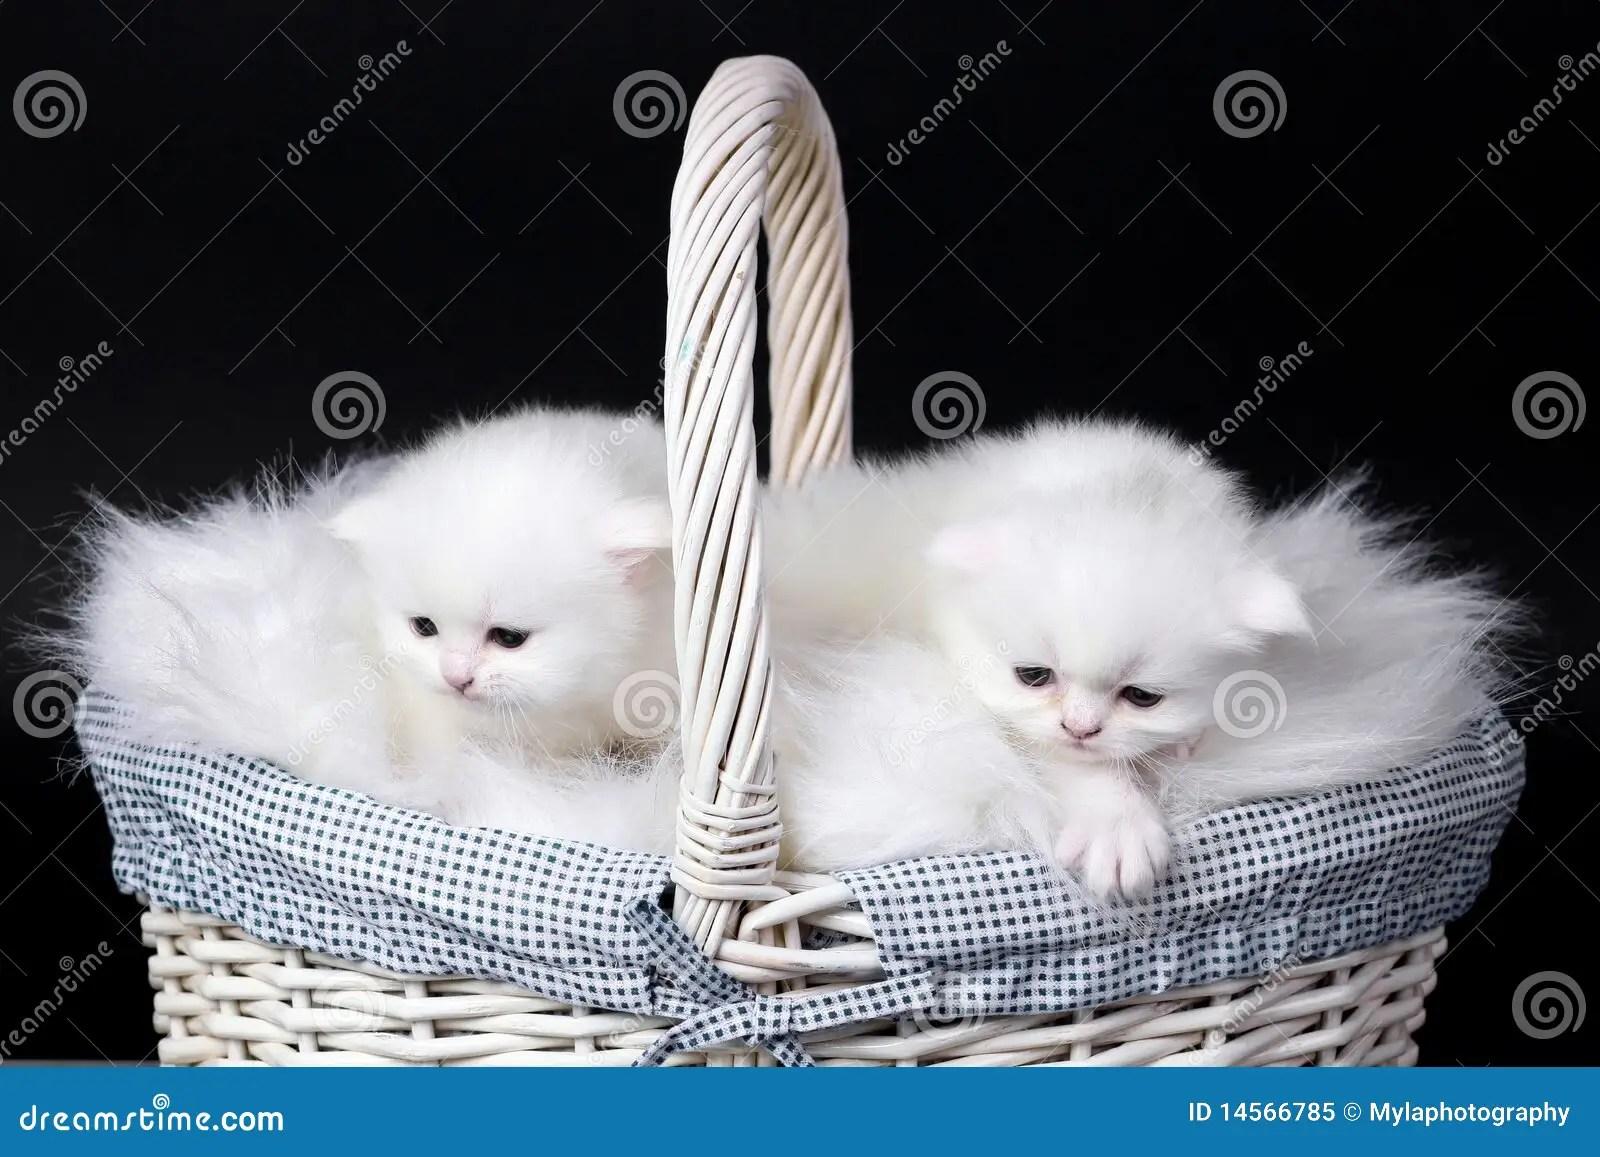 Cute Kitten Wallpaper Free White Persian Kittens Stock Image Image Of Persian